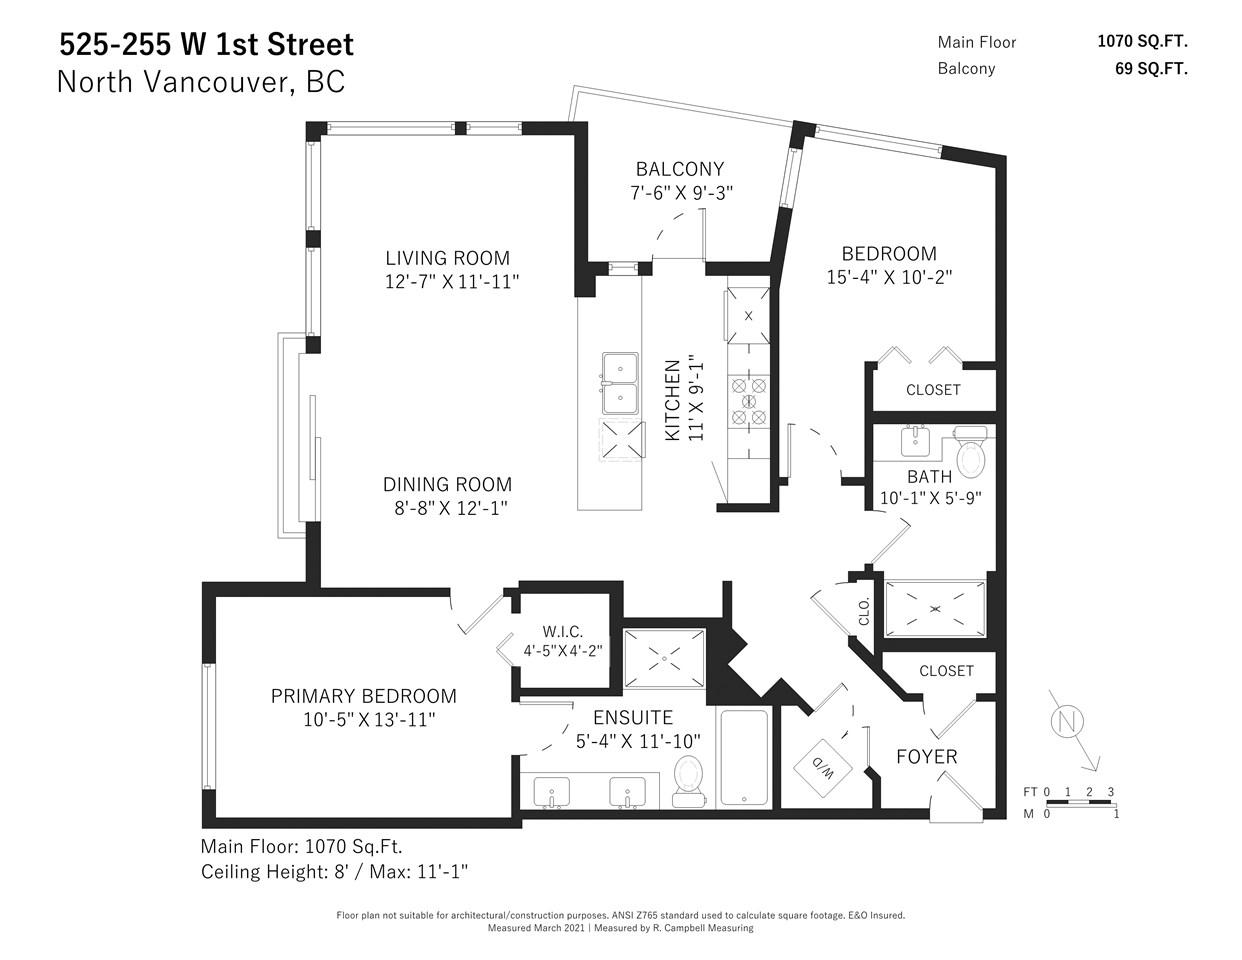 Listing Image of 525 255 W 1ST STREET